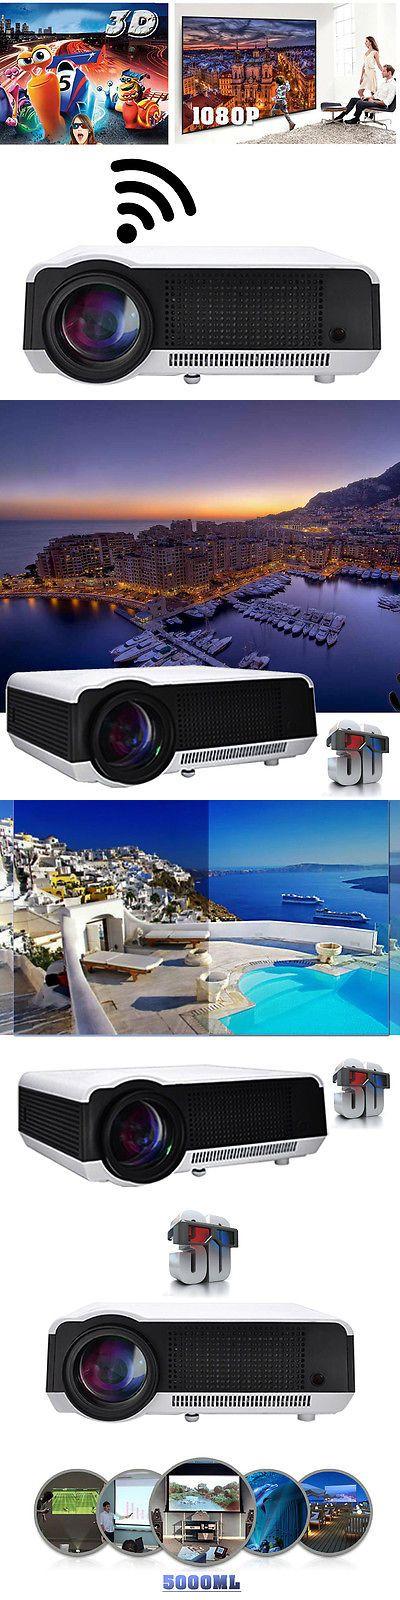 size zero video songs 1080p projectors